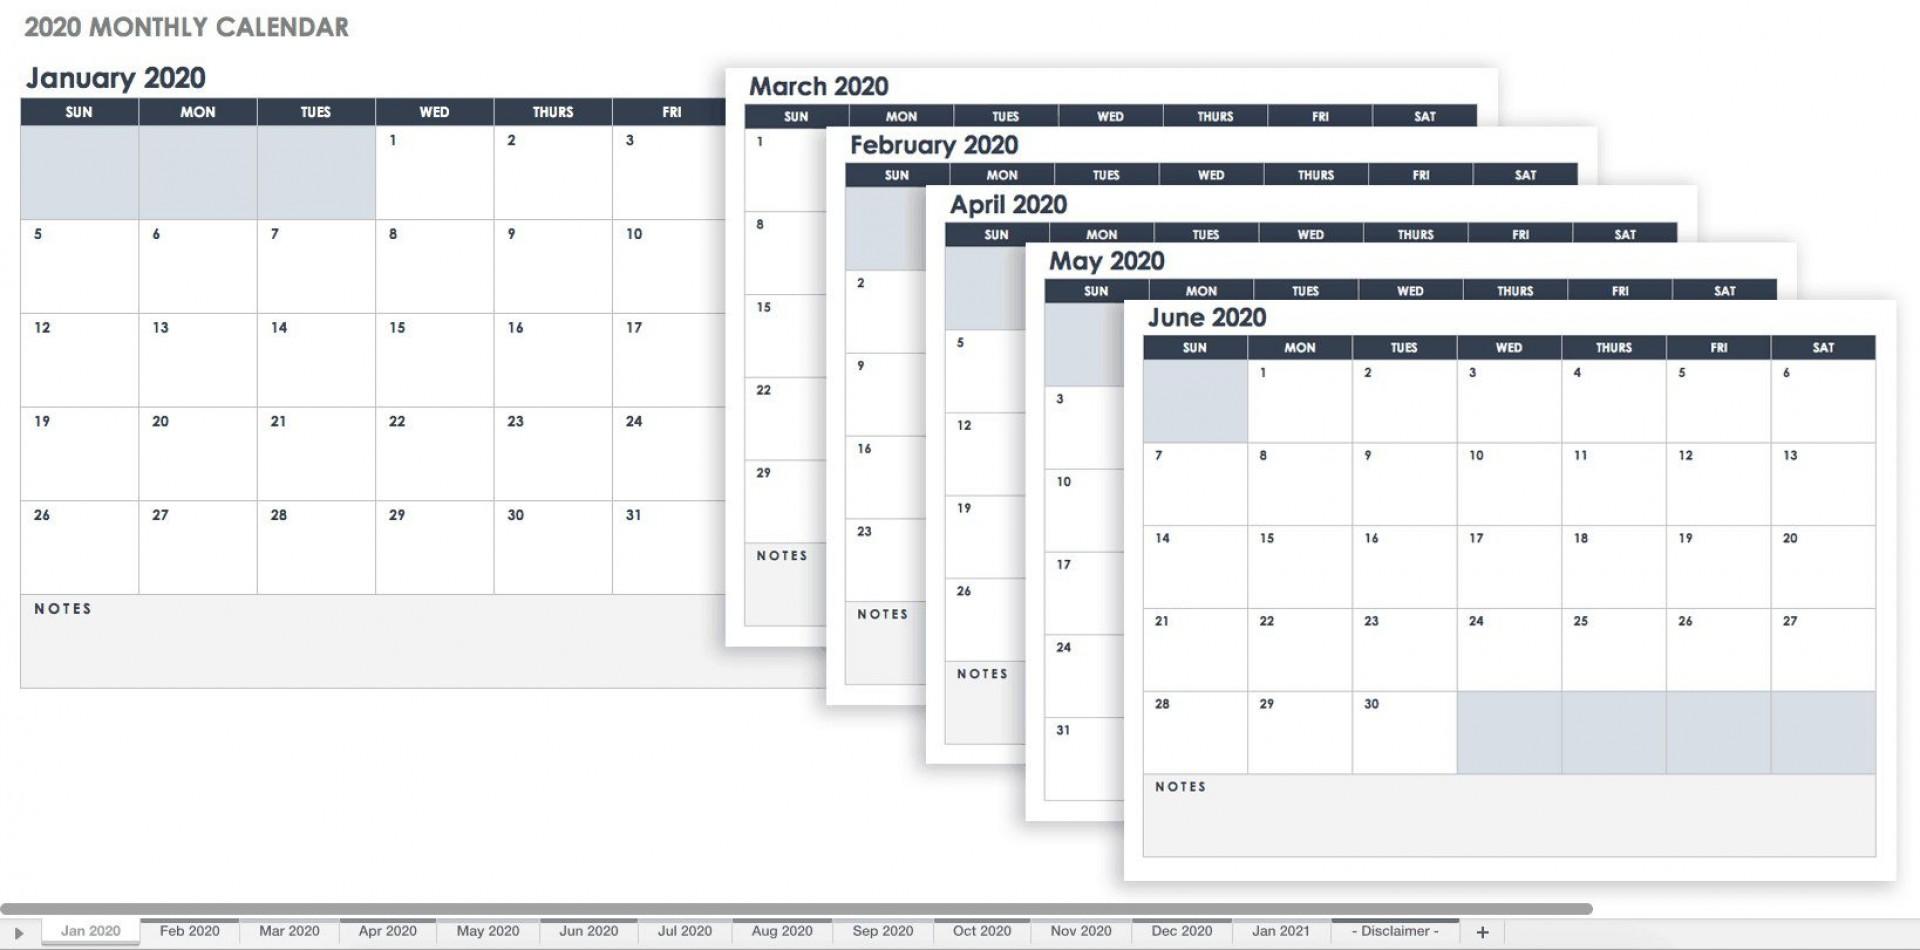 005 Simple Google Sheet Calendar Template Photo  Templates Monthly Spreadsheet 2020 20181920